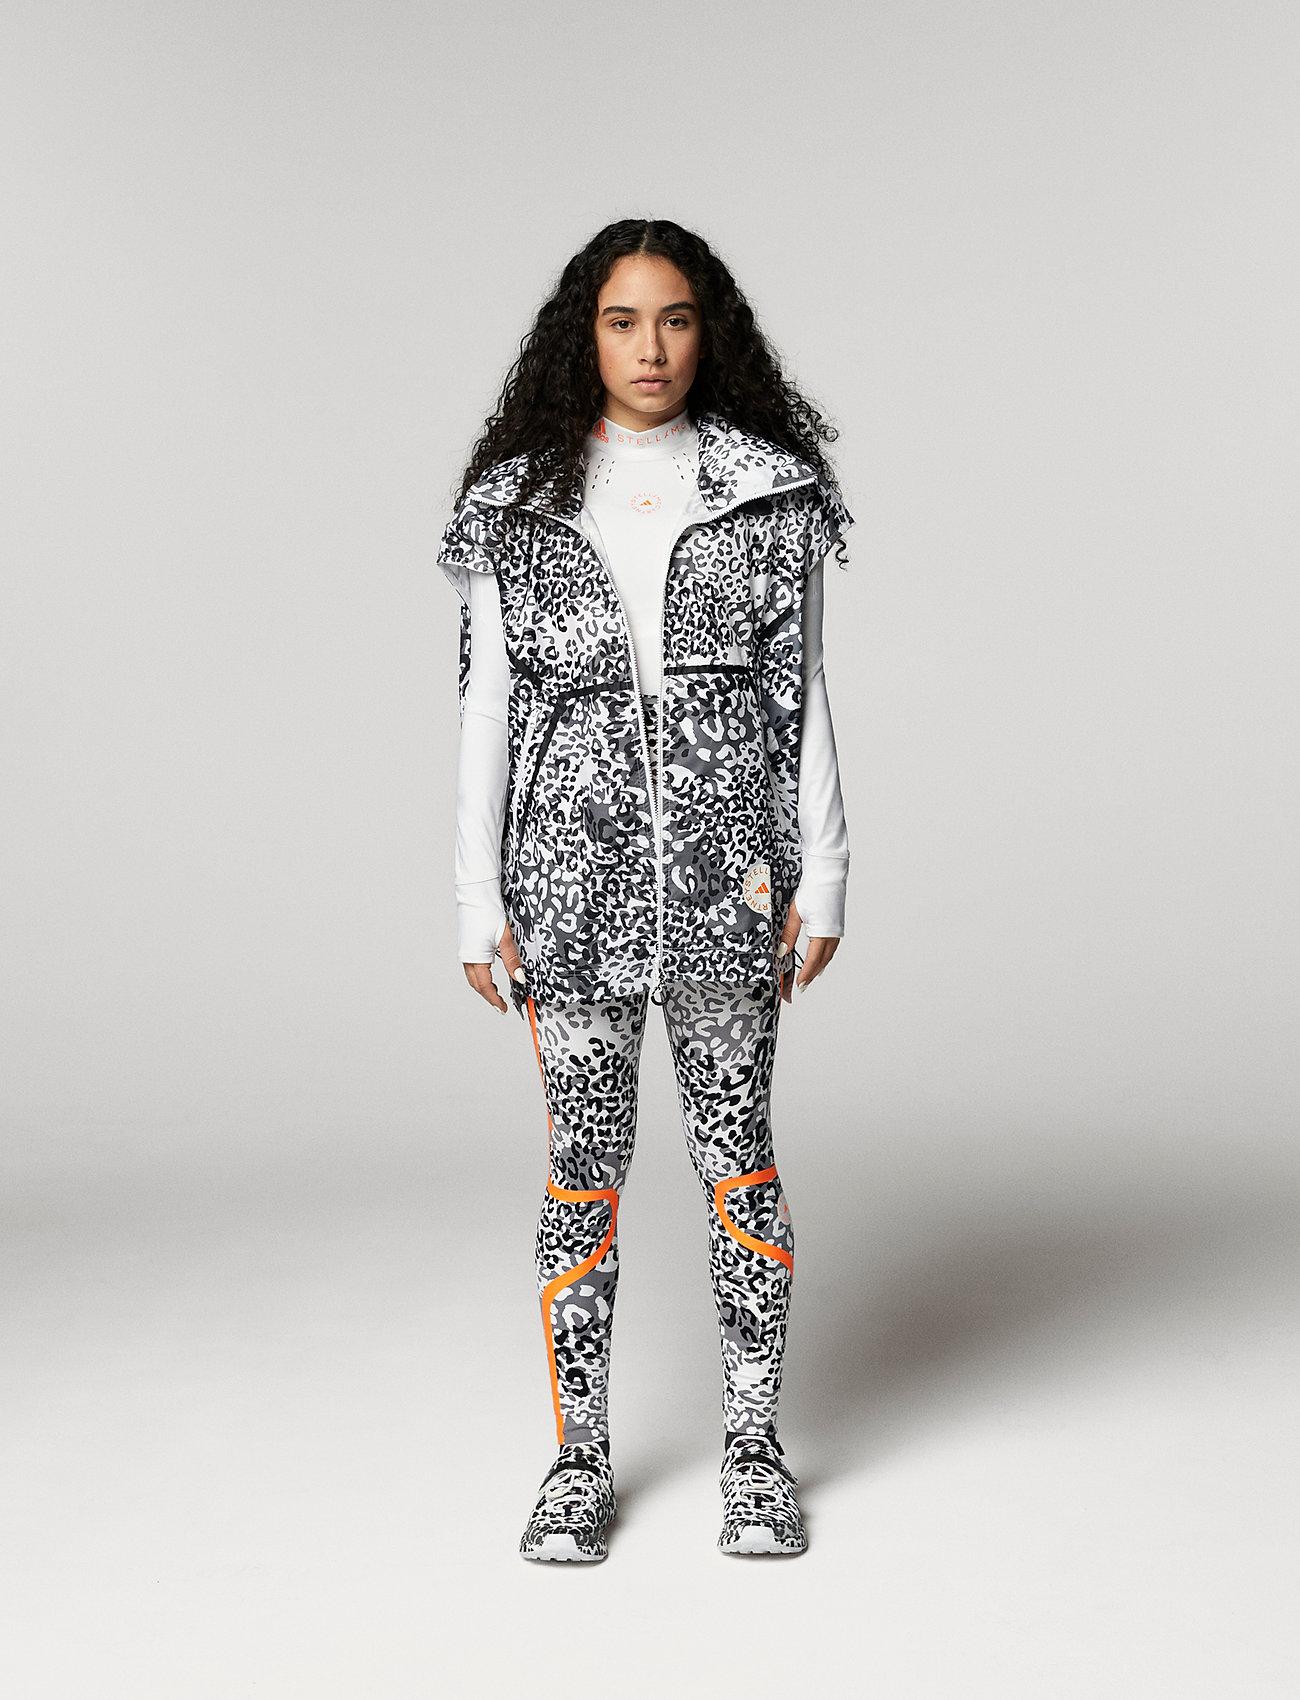 adidas by Stella McCartney - TRUEPACE GILET - gevoerde vesten - white/black/ash - 0